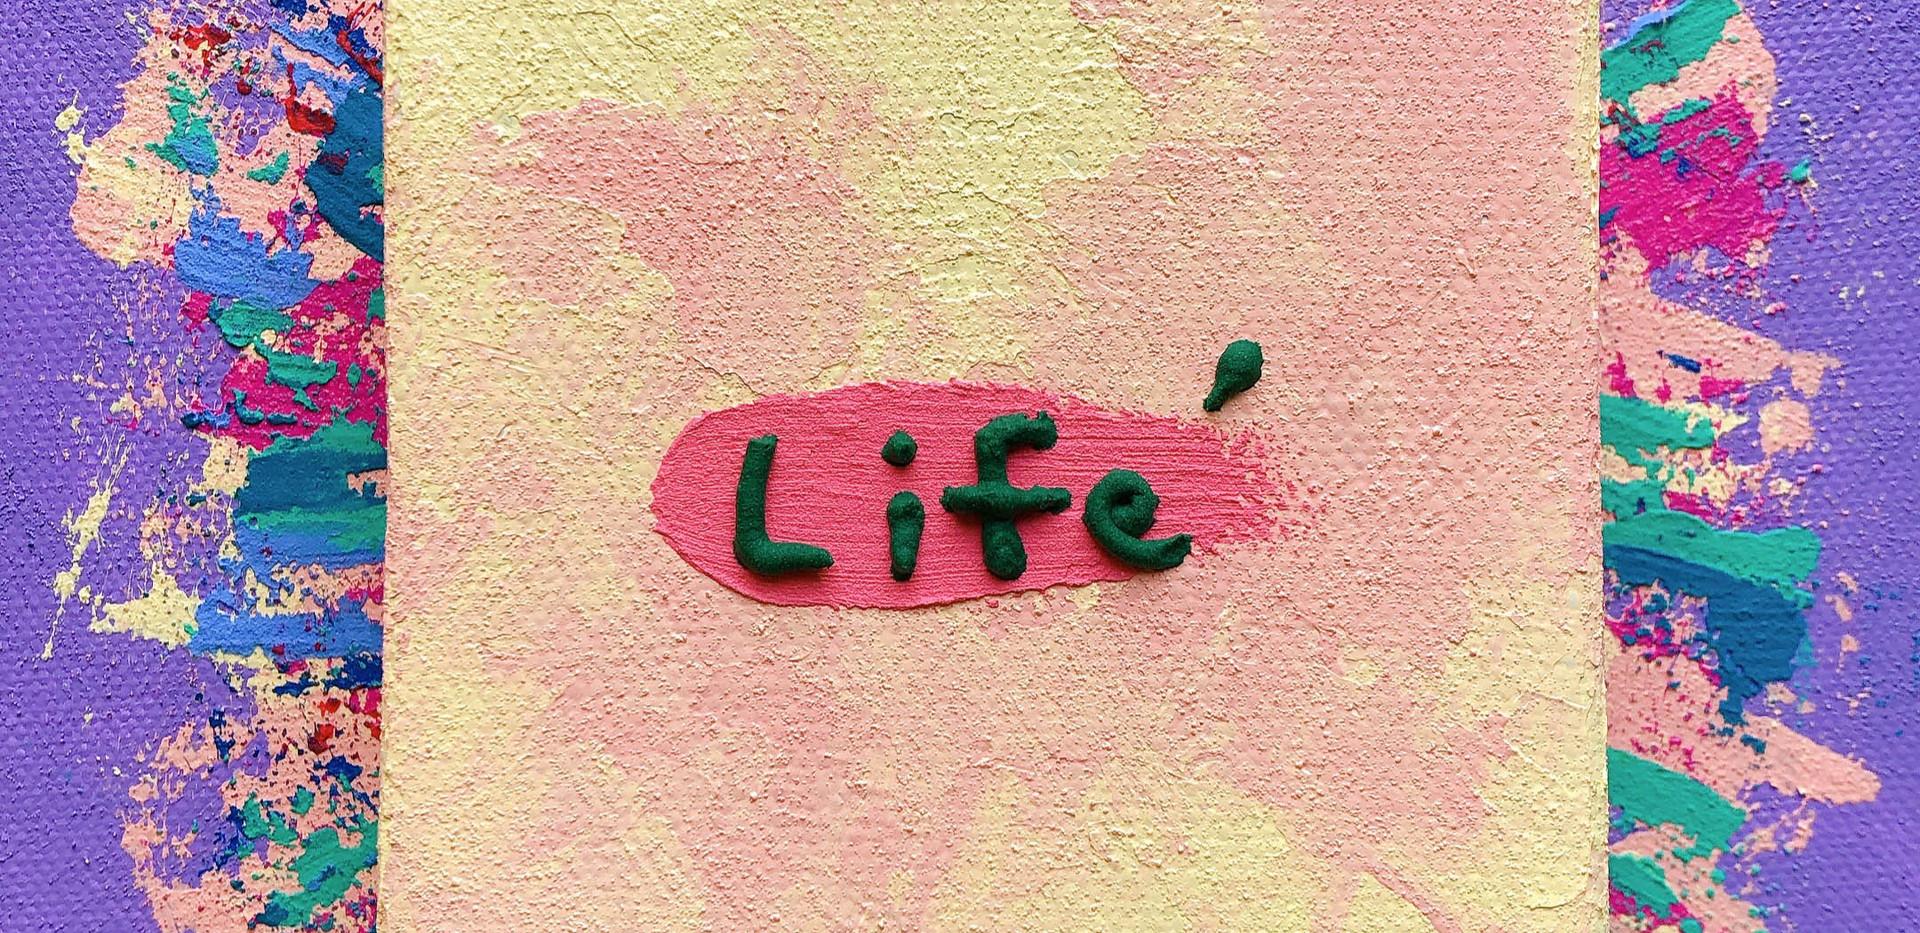 Life5.jpg